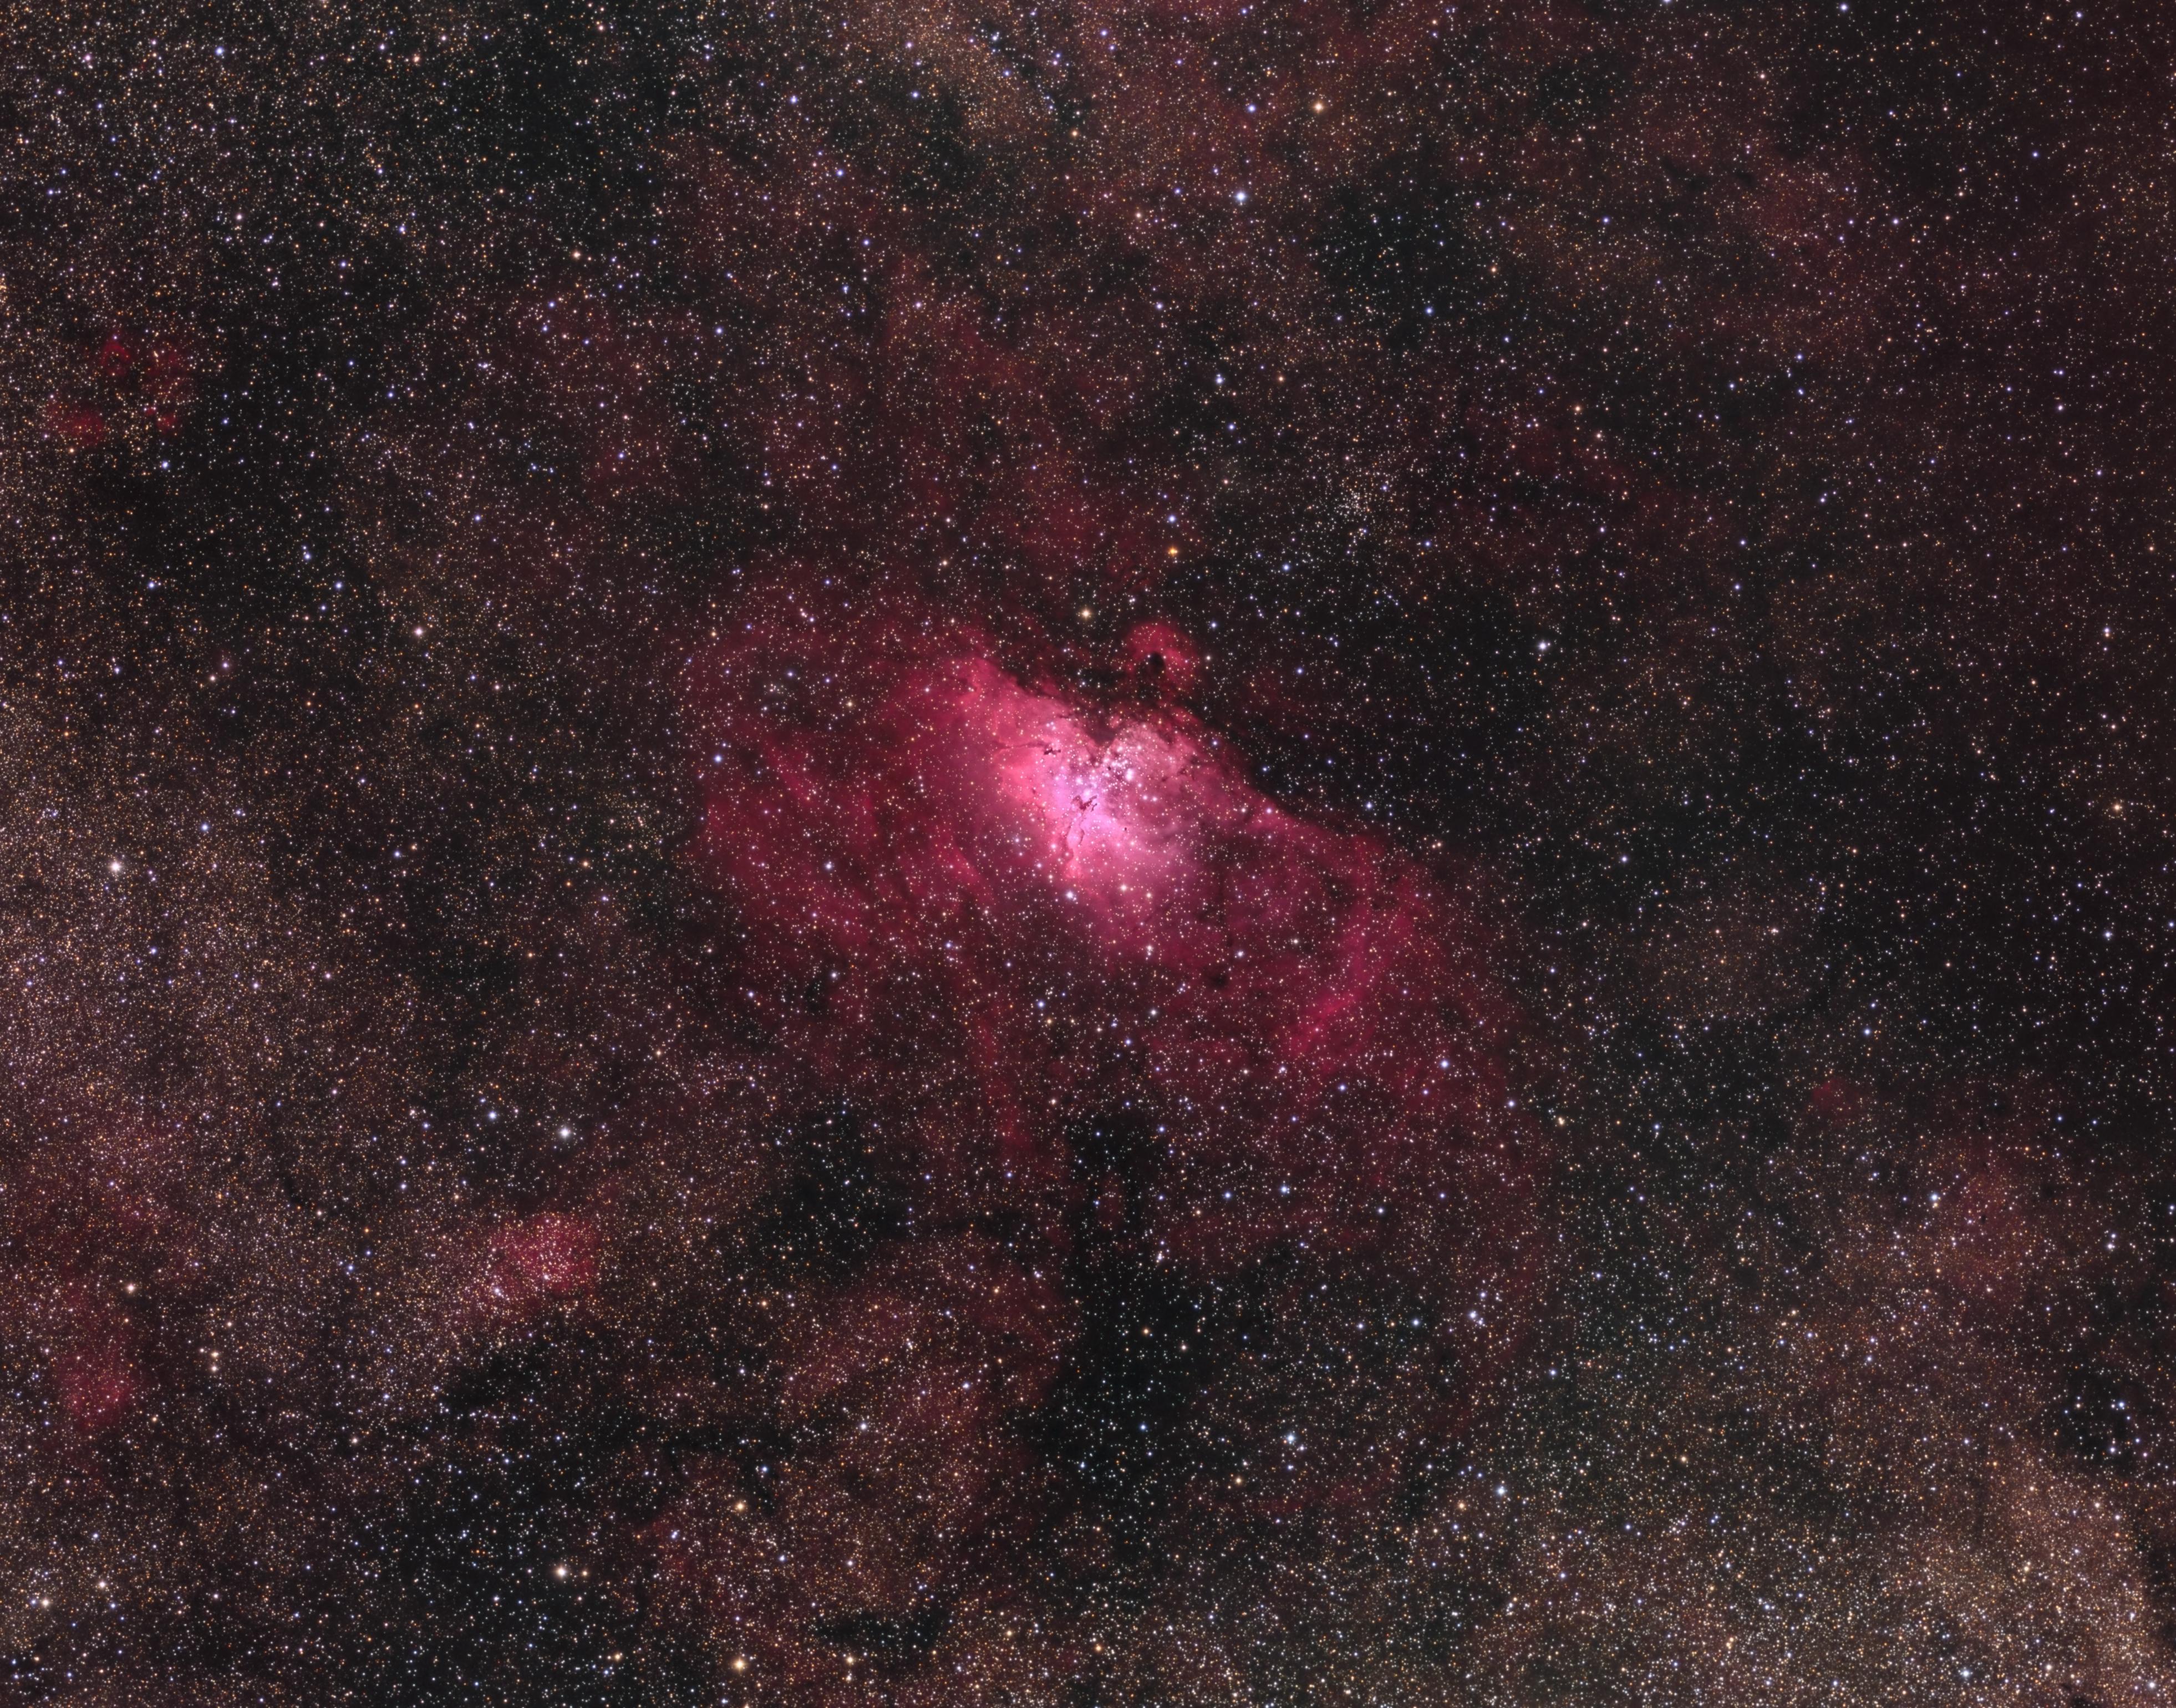 m16 eagle nebula face - photo #45